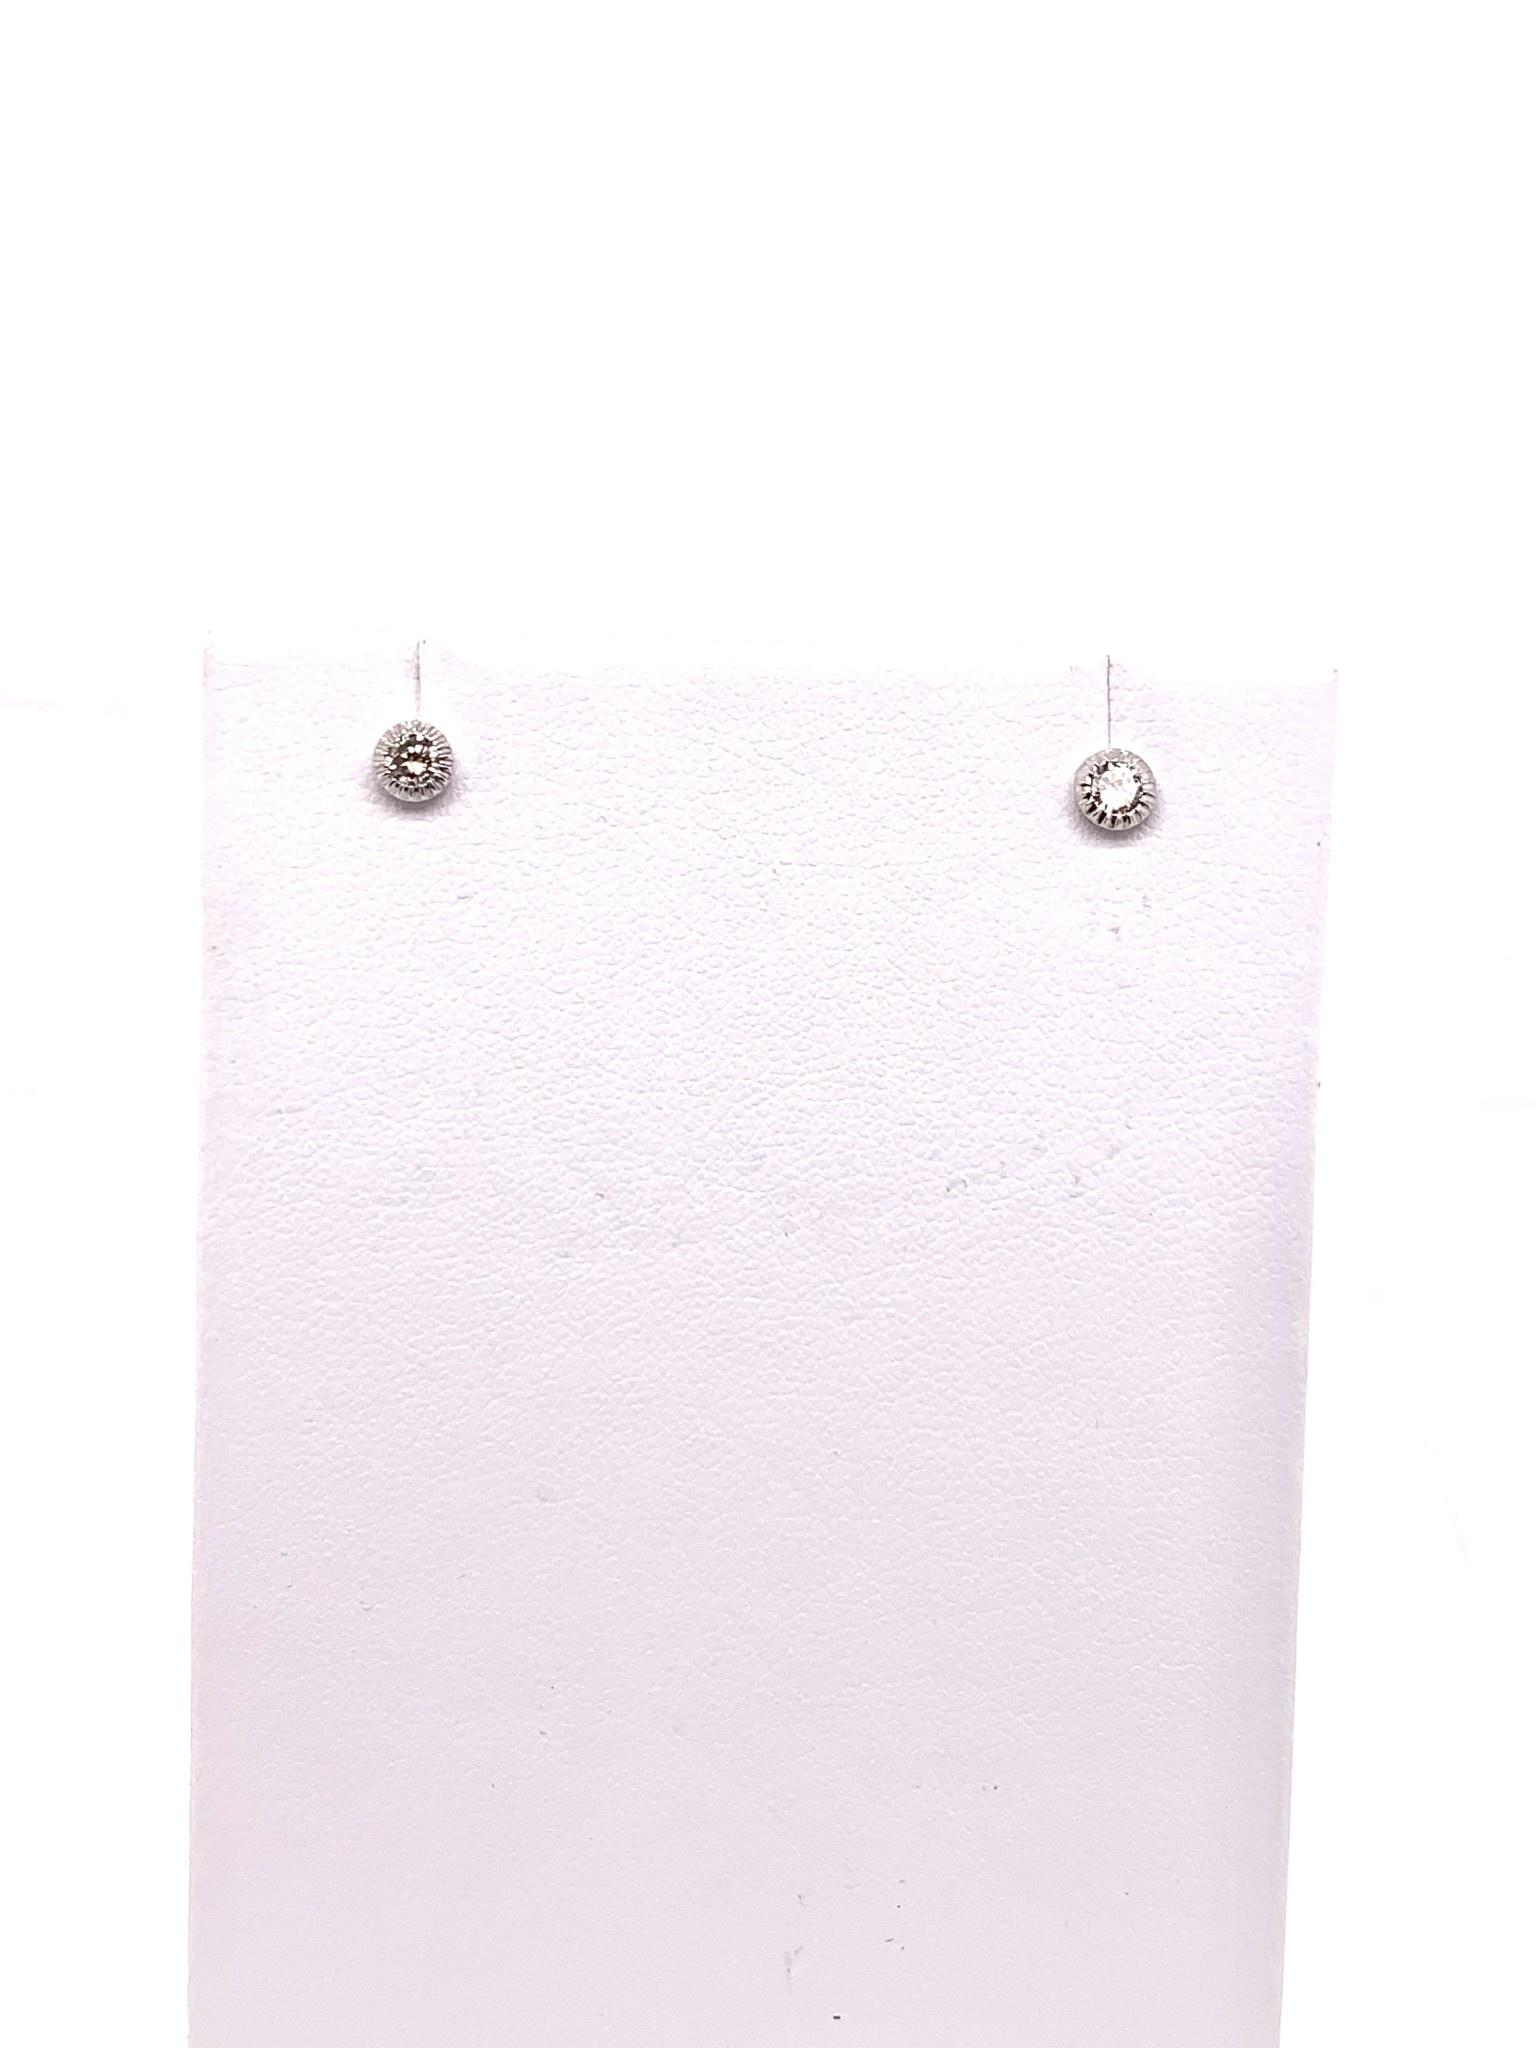 14K white gold 0.25ct diamond stud earrings with filigree